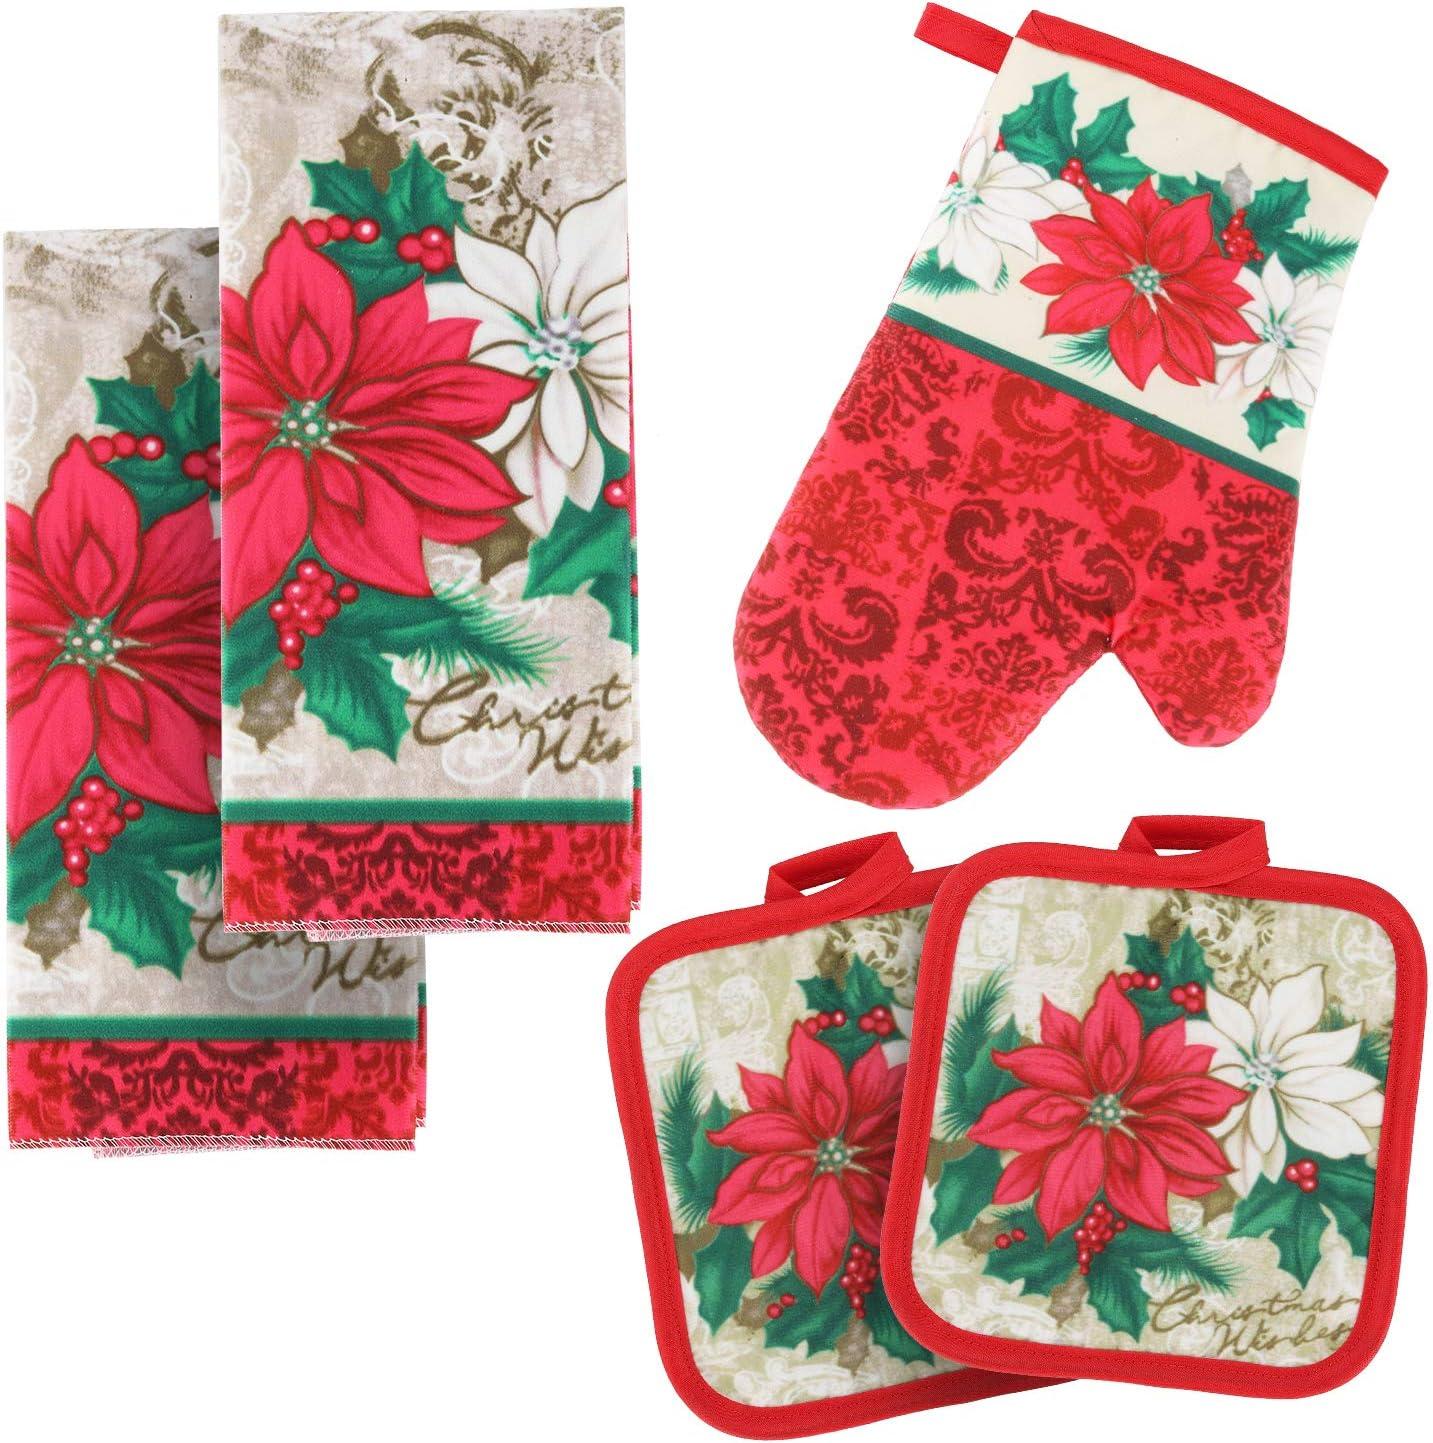 BONTHEE Kitchen Linen Set 2 Kitchen Towels 2 Pot Holders 1 Oven Mitt for Baking Cooking Kitchen Décor – Poinsettia